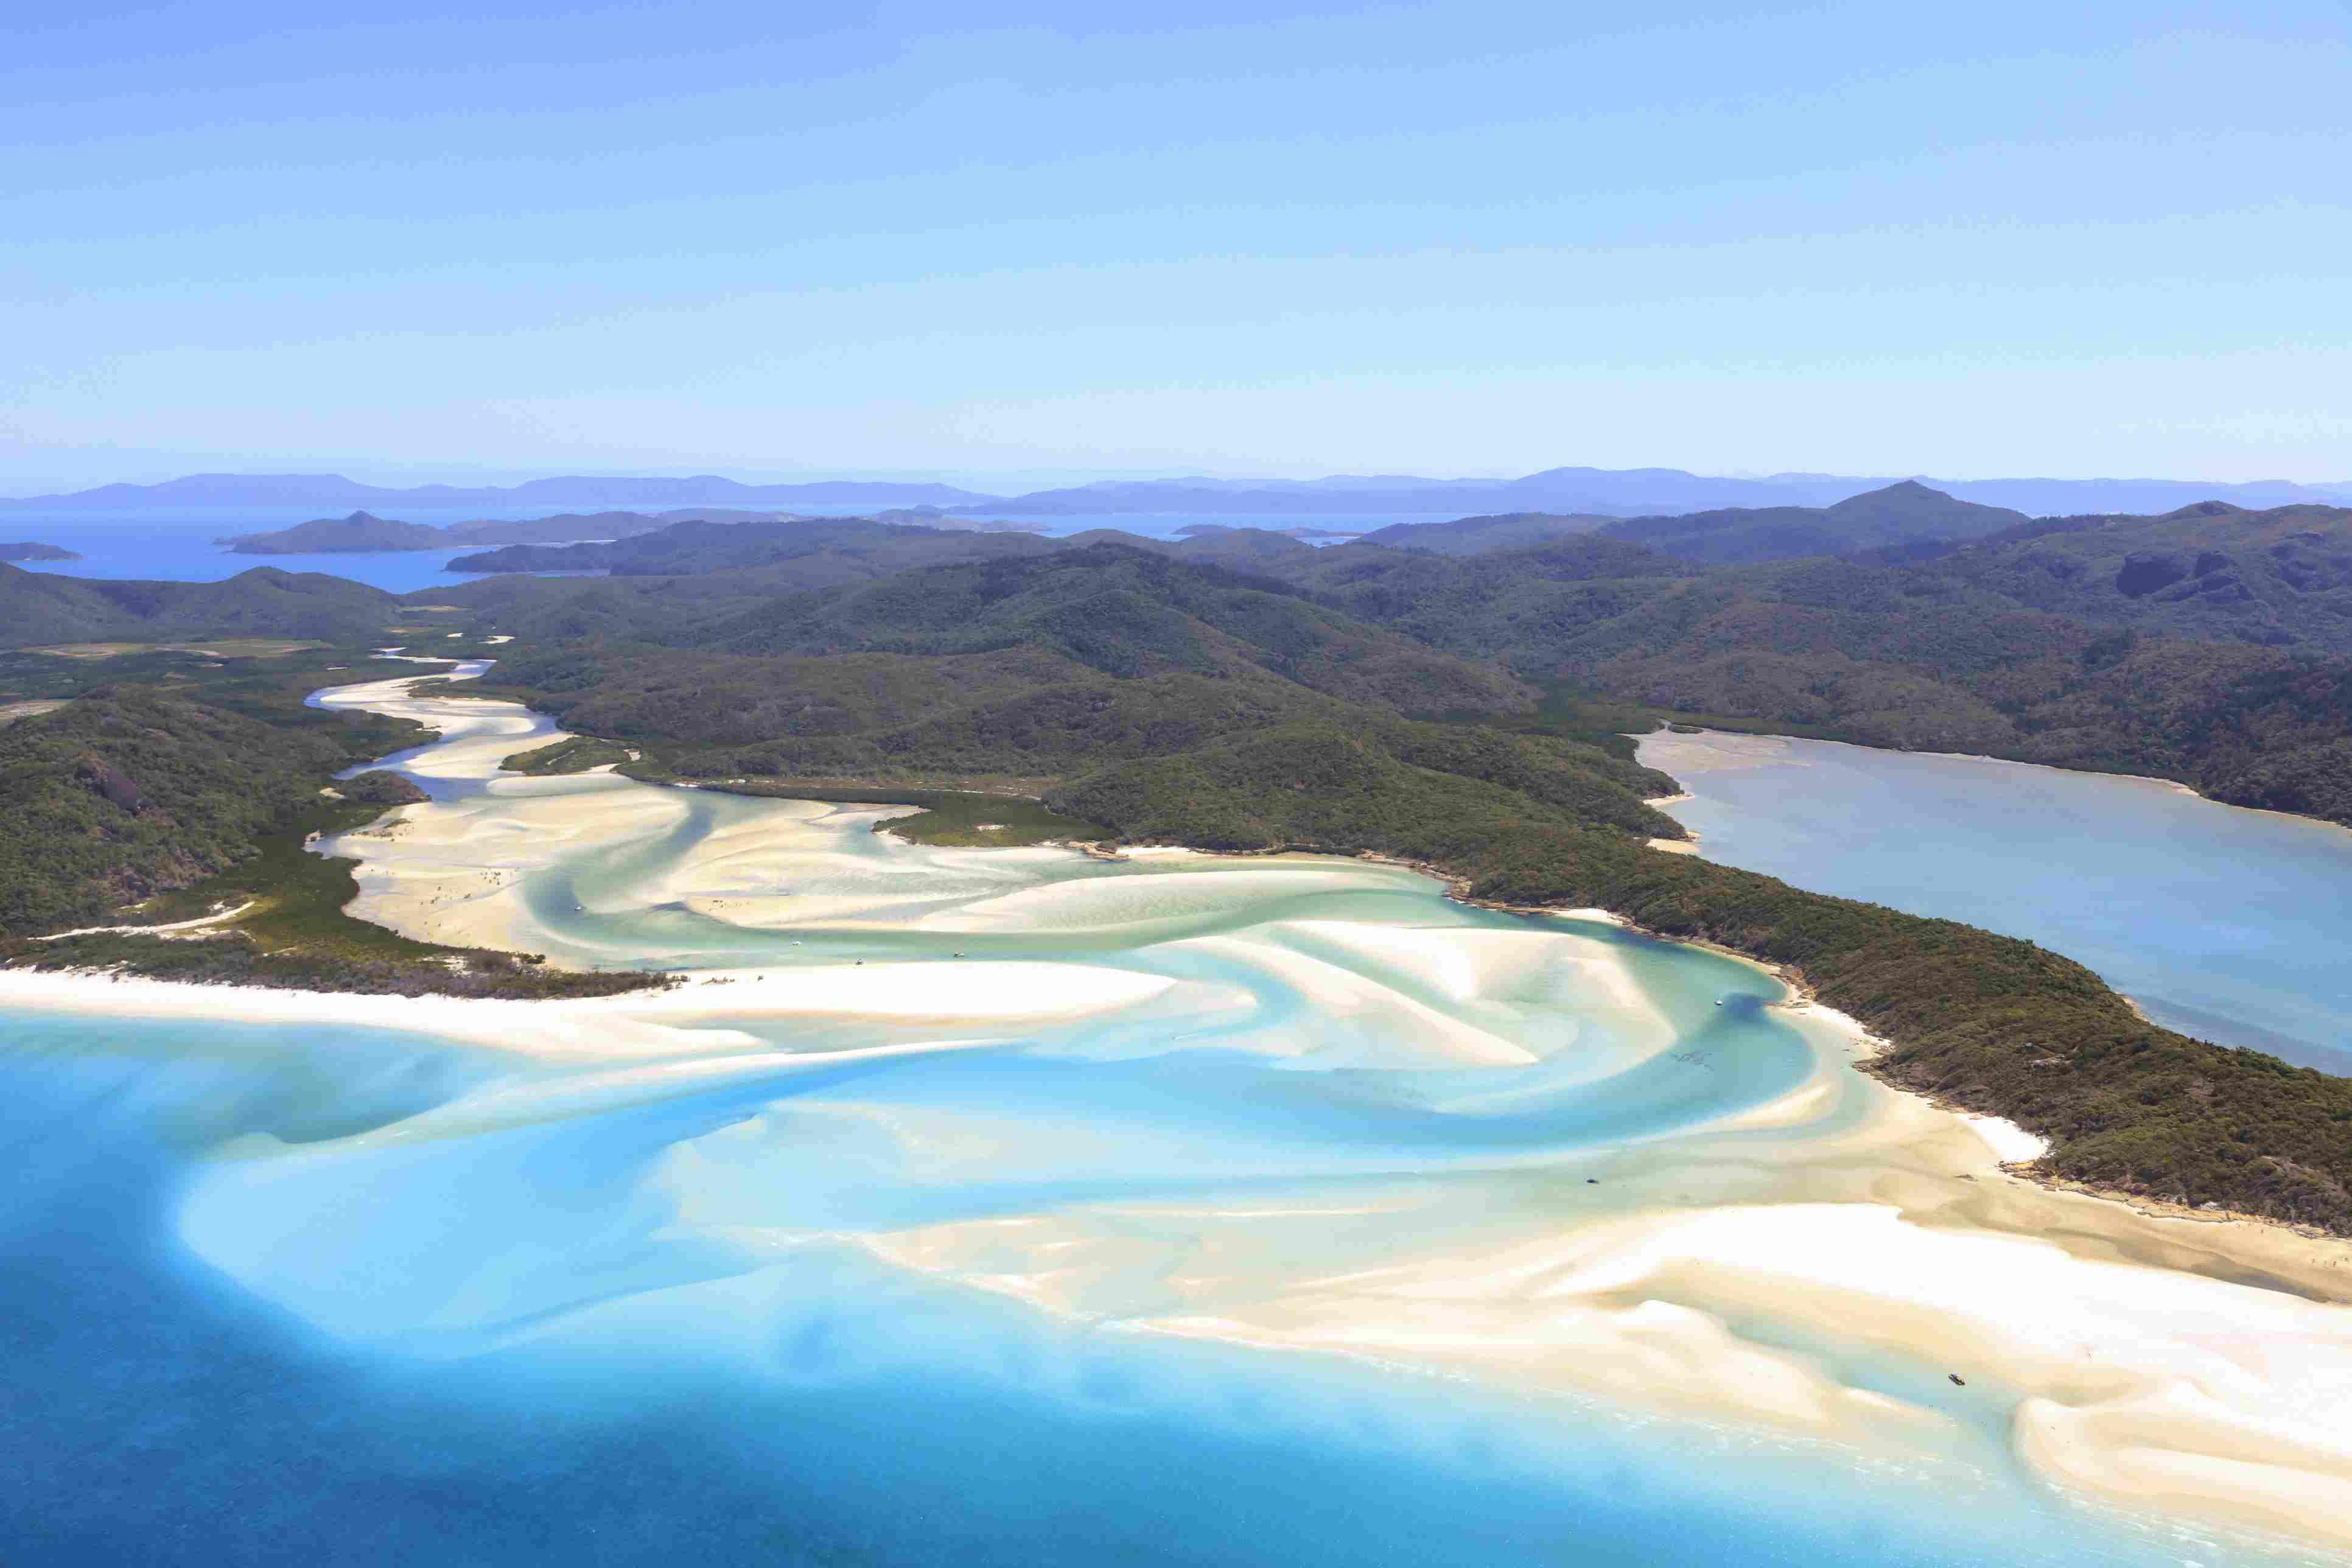 Whitsunday Inseln, Australien